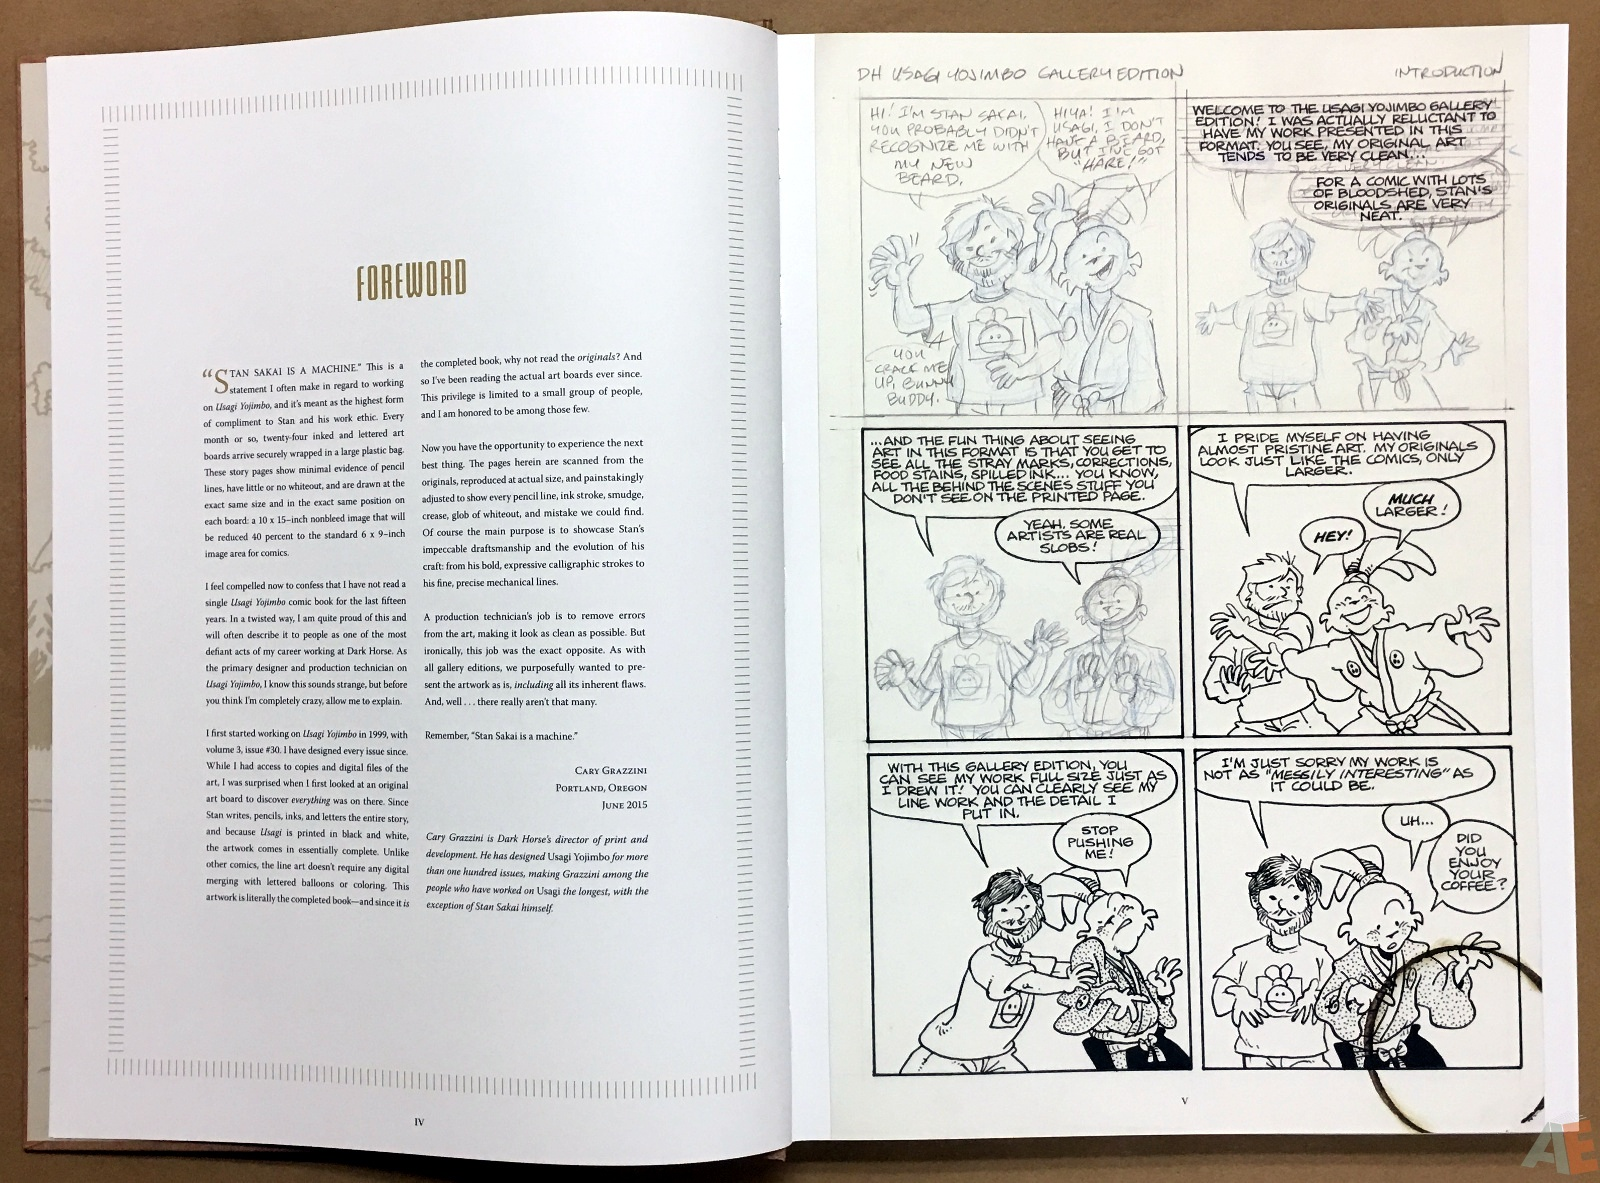 Usagi Yojimbo: Samurai and Other Stories Gallery Edition 6